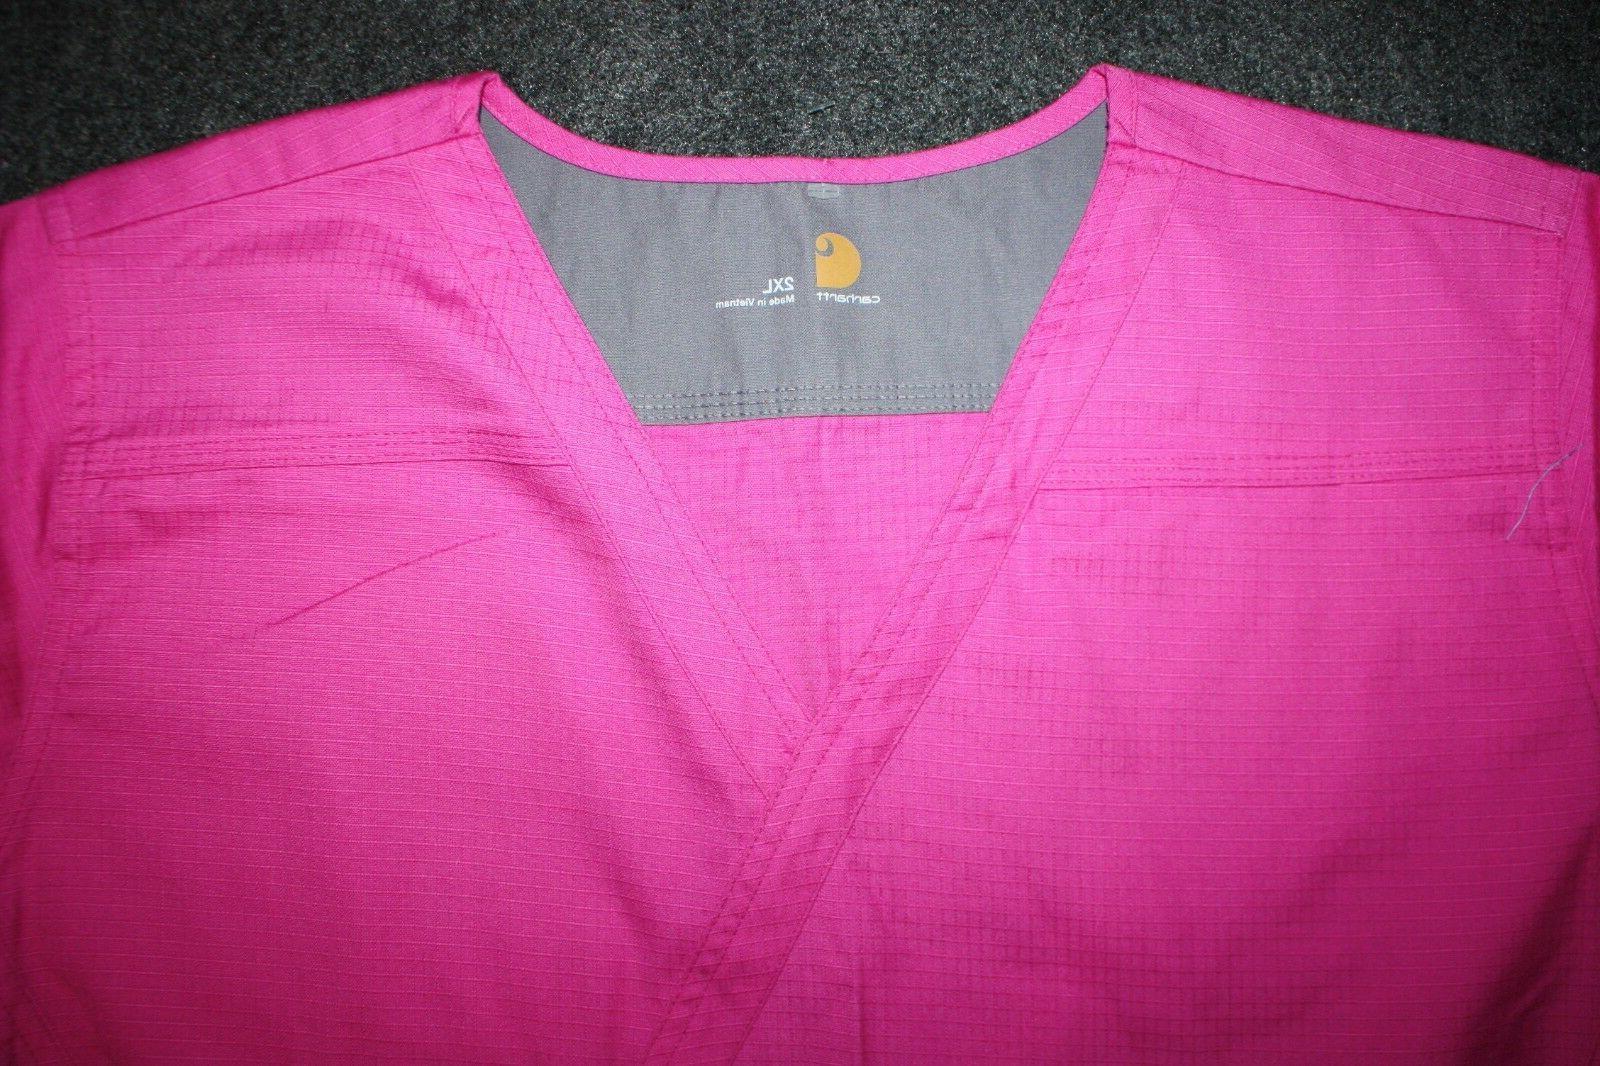 Carhartt Womens Medical Scrubs Set Pink Plus Size 2XL